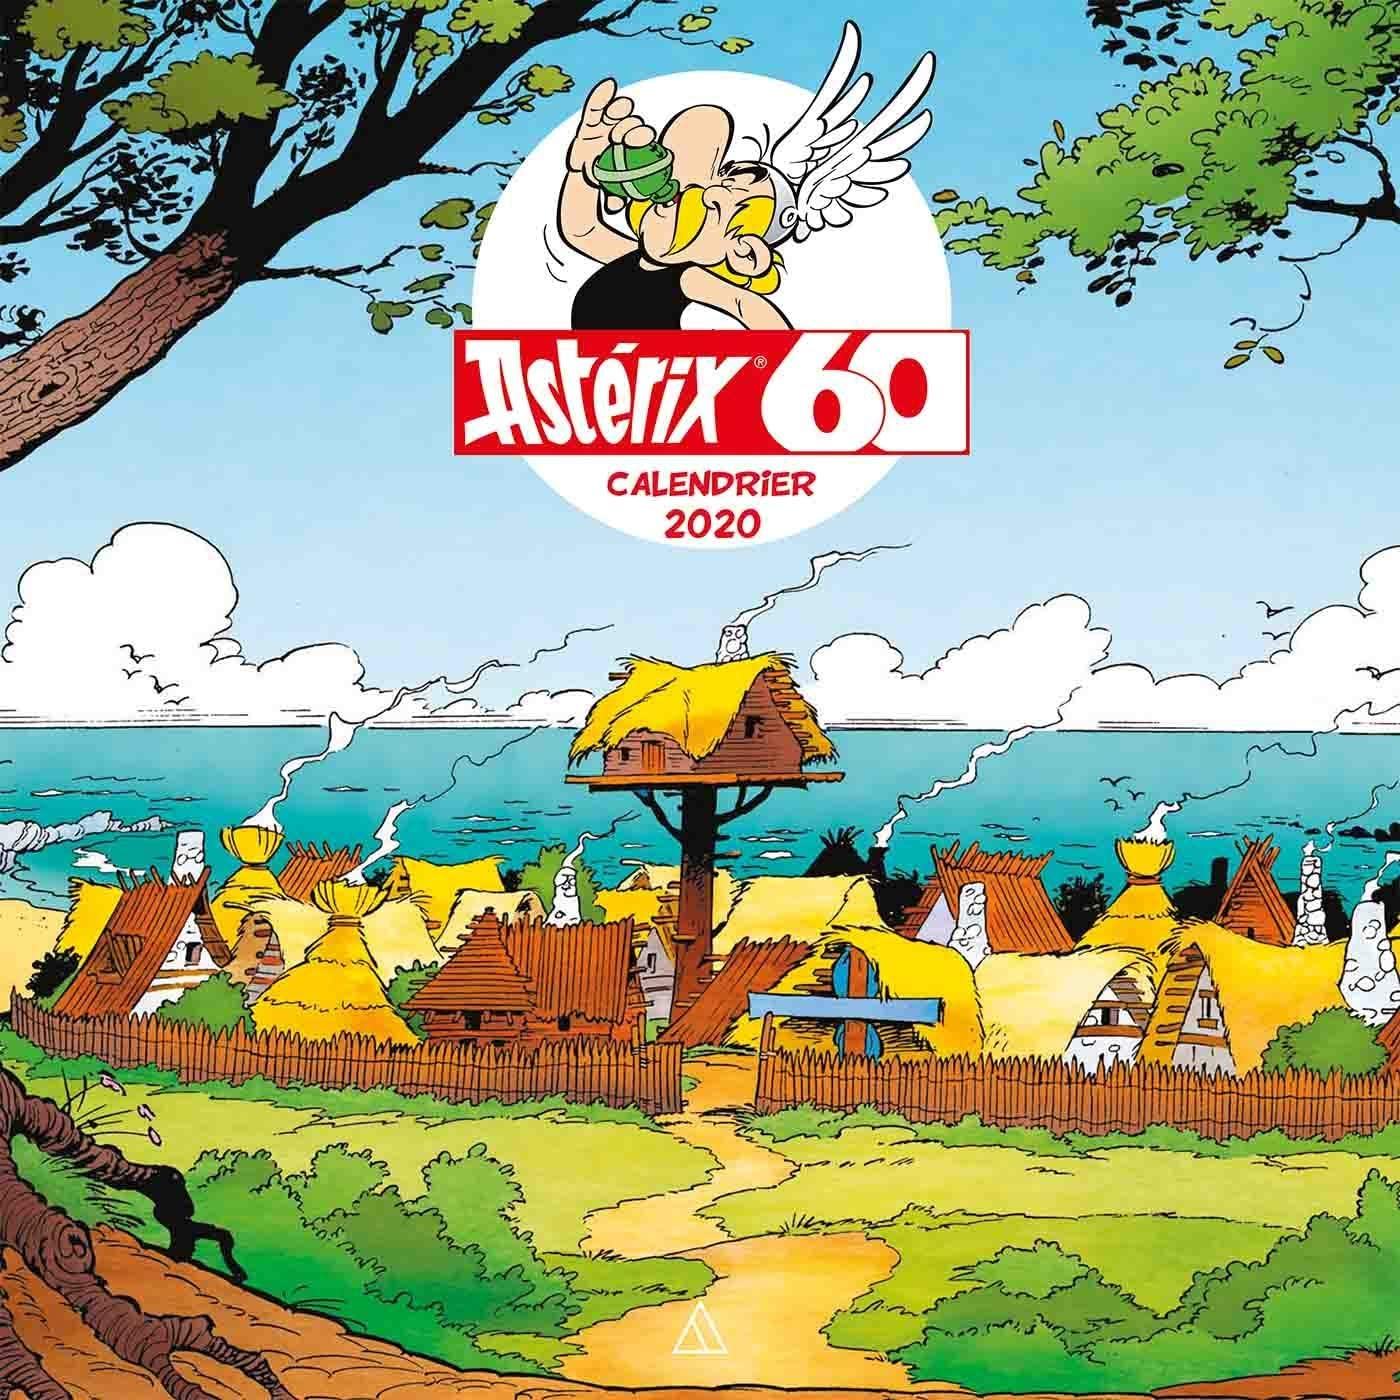 Calendrier mural - Astérix + stickers - septembre 2019 81DZb%2BKHG1L._AC_SL1500_